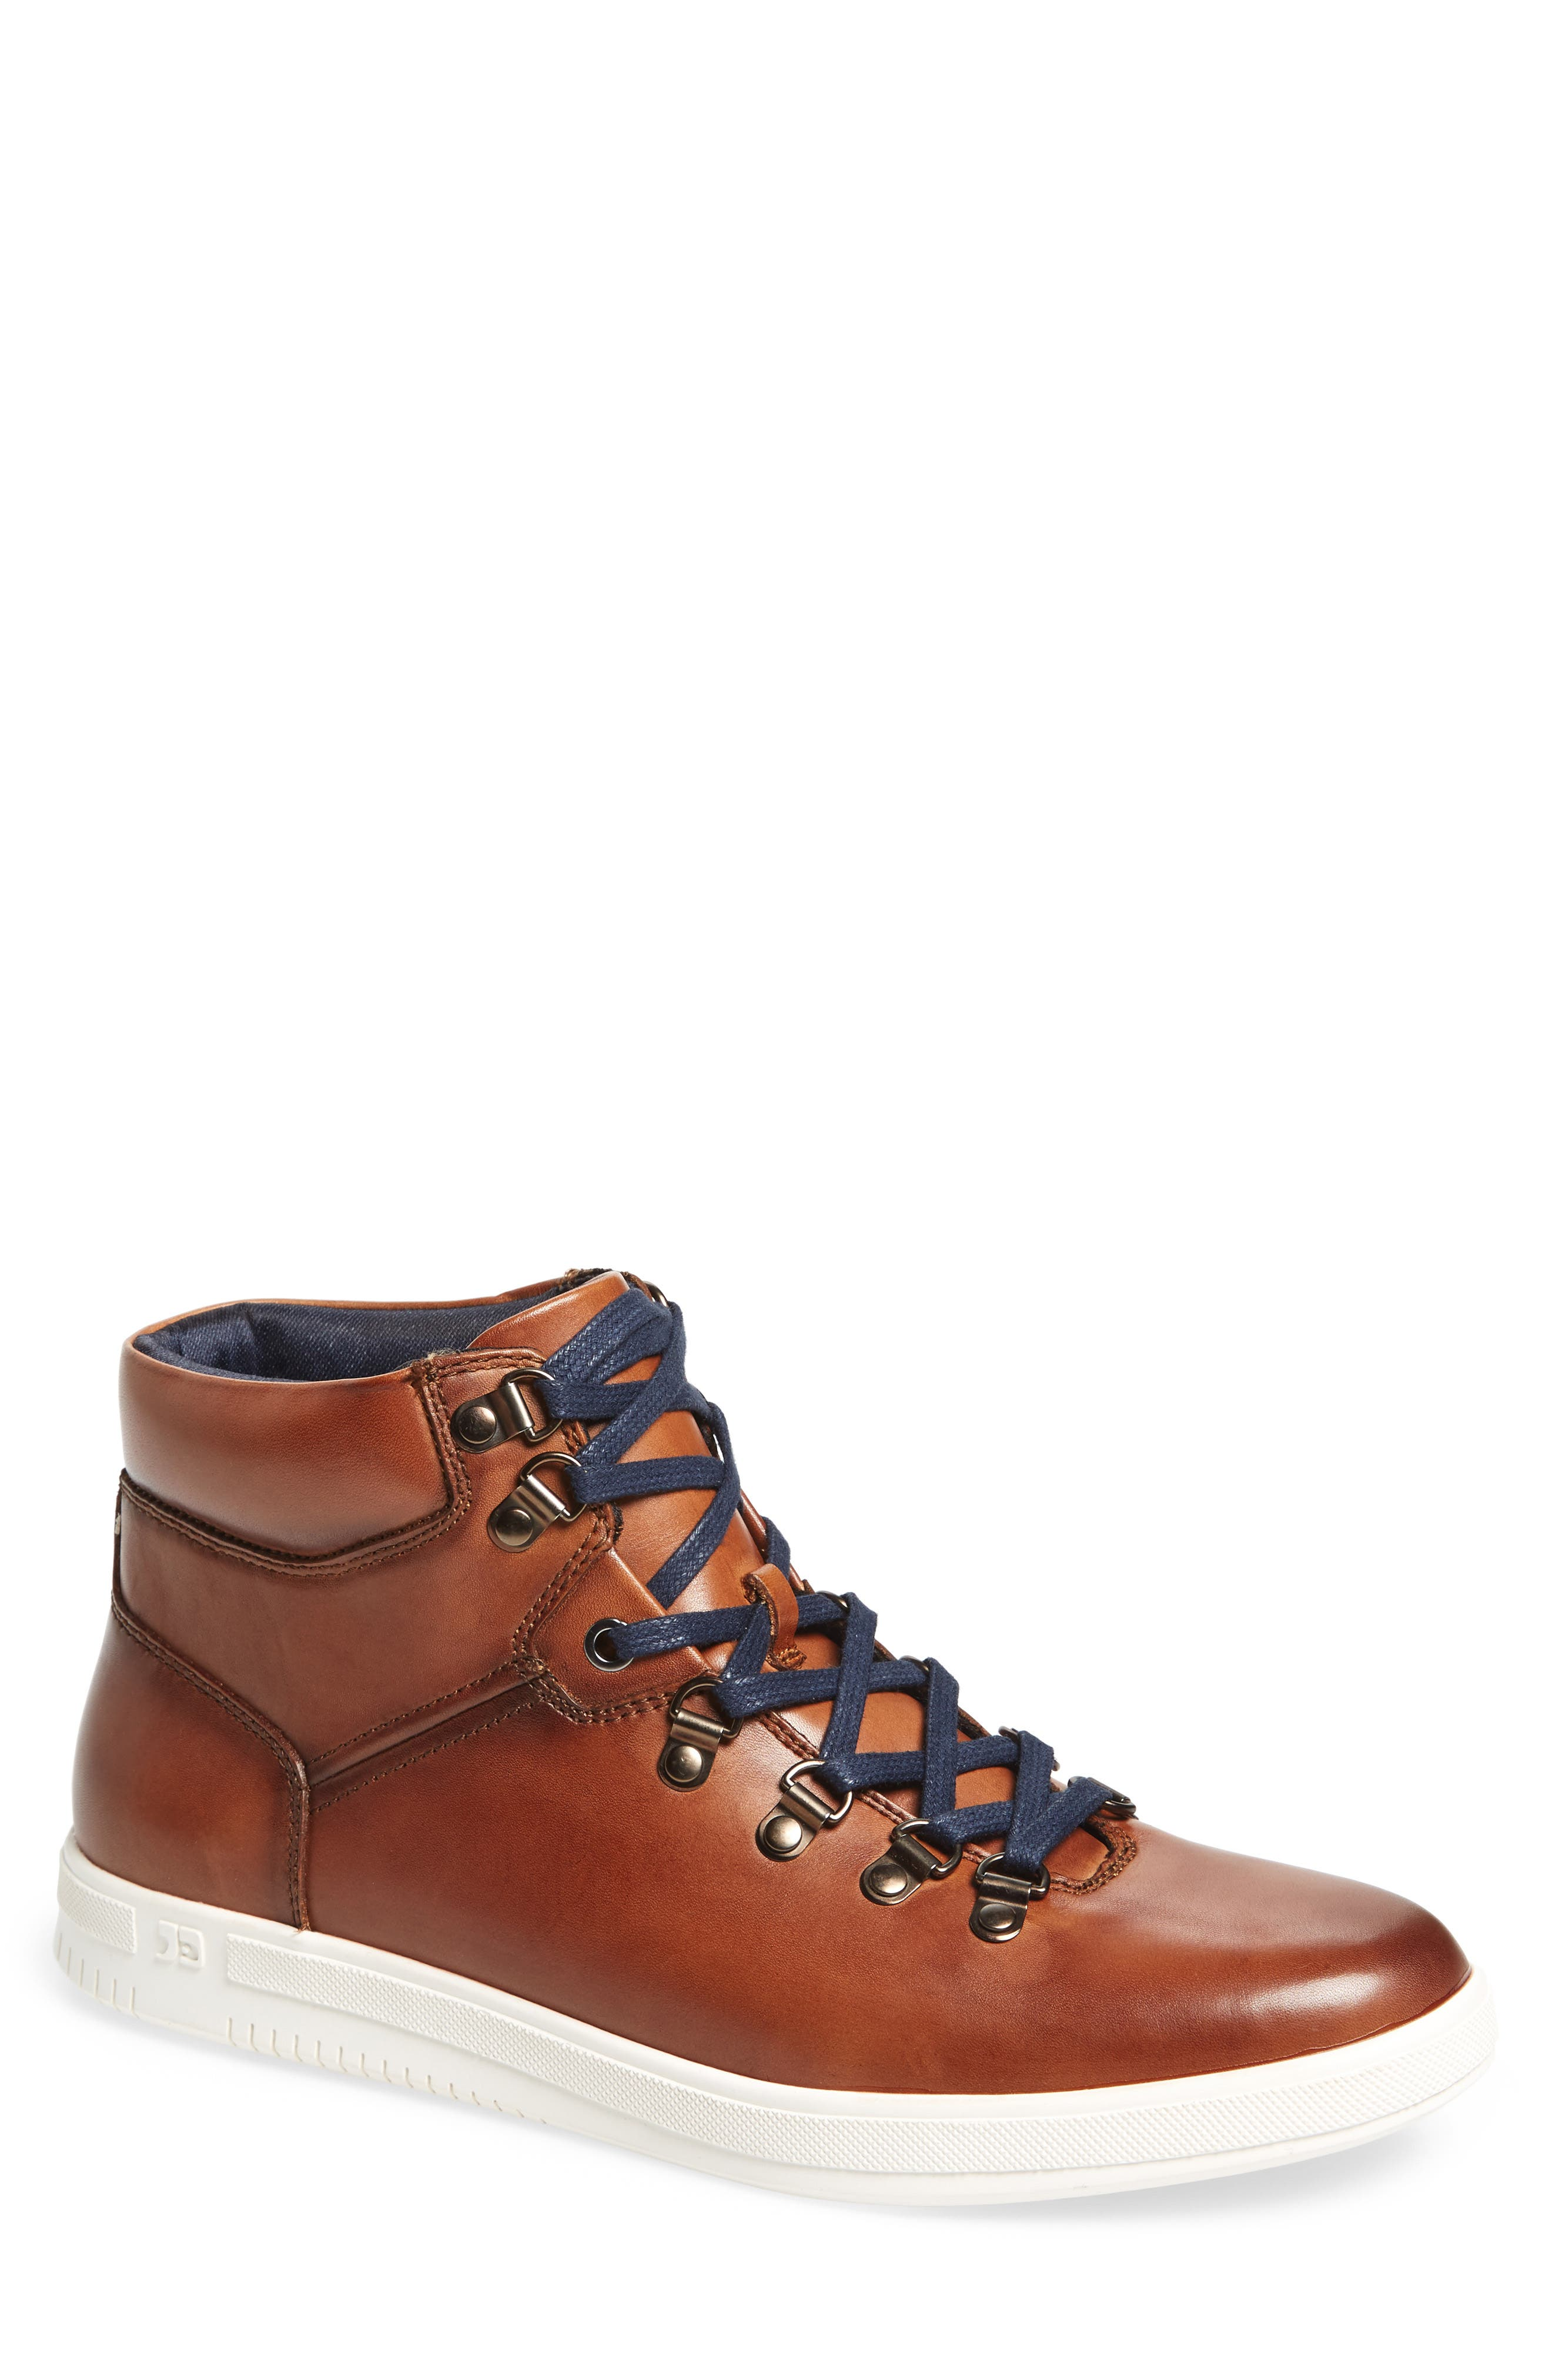 Slow Joe Mid Top Sneaker,                             Main thumbnail 1, color,                             Tan Leather